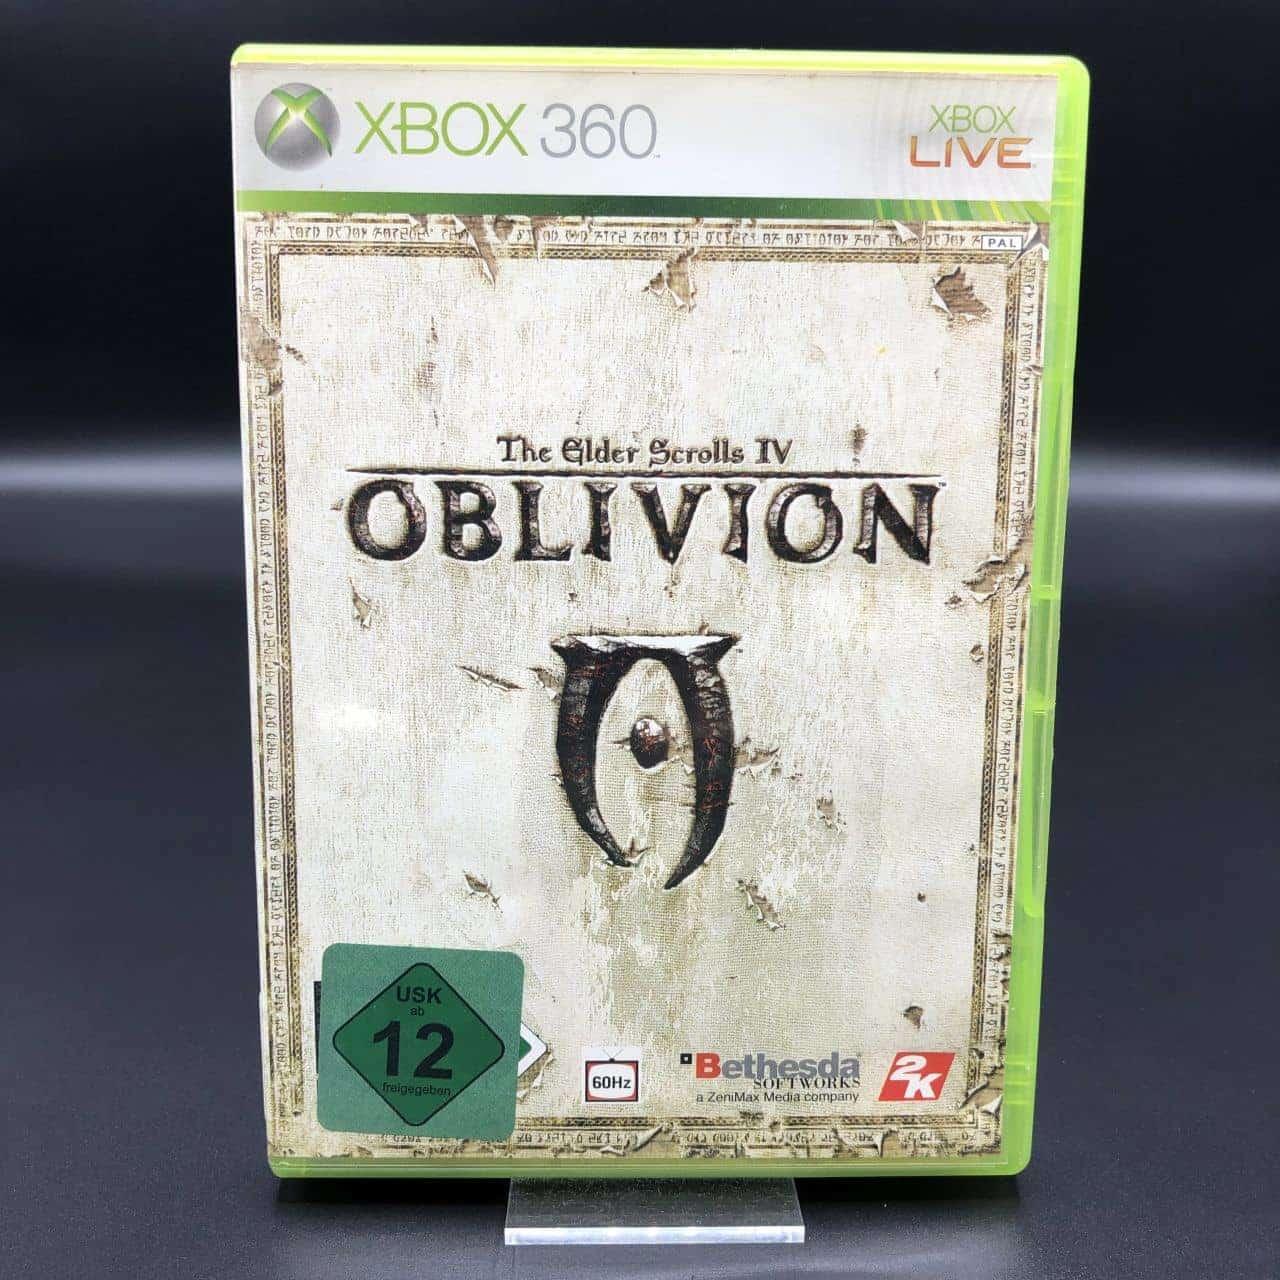 The Elder Scrolls IV: Oblivion (Komplett) (Sehr gut) XBOX 360